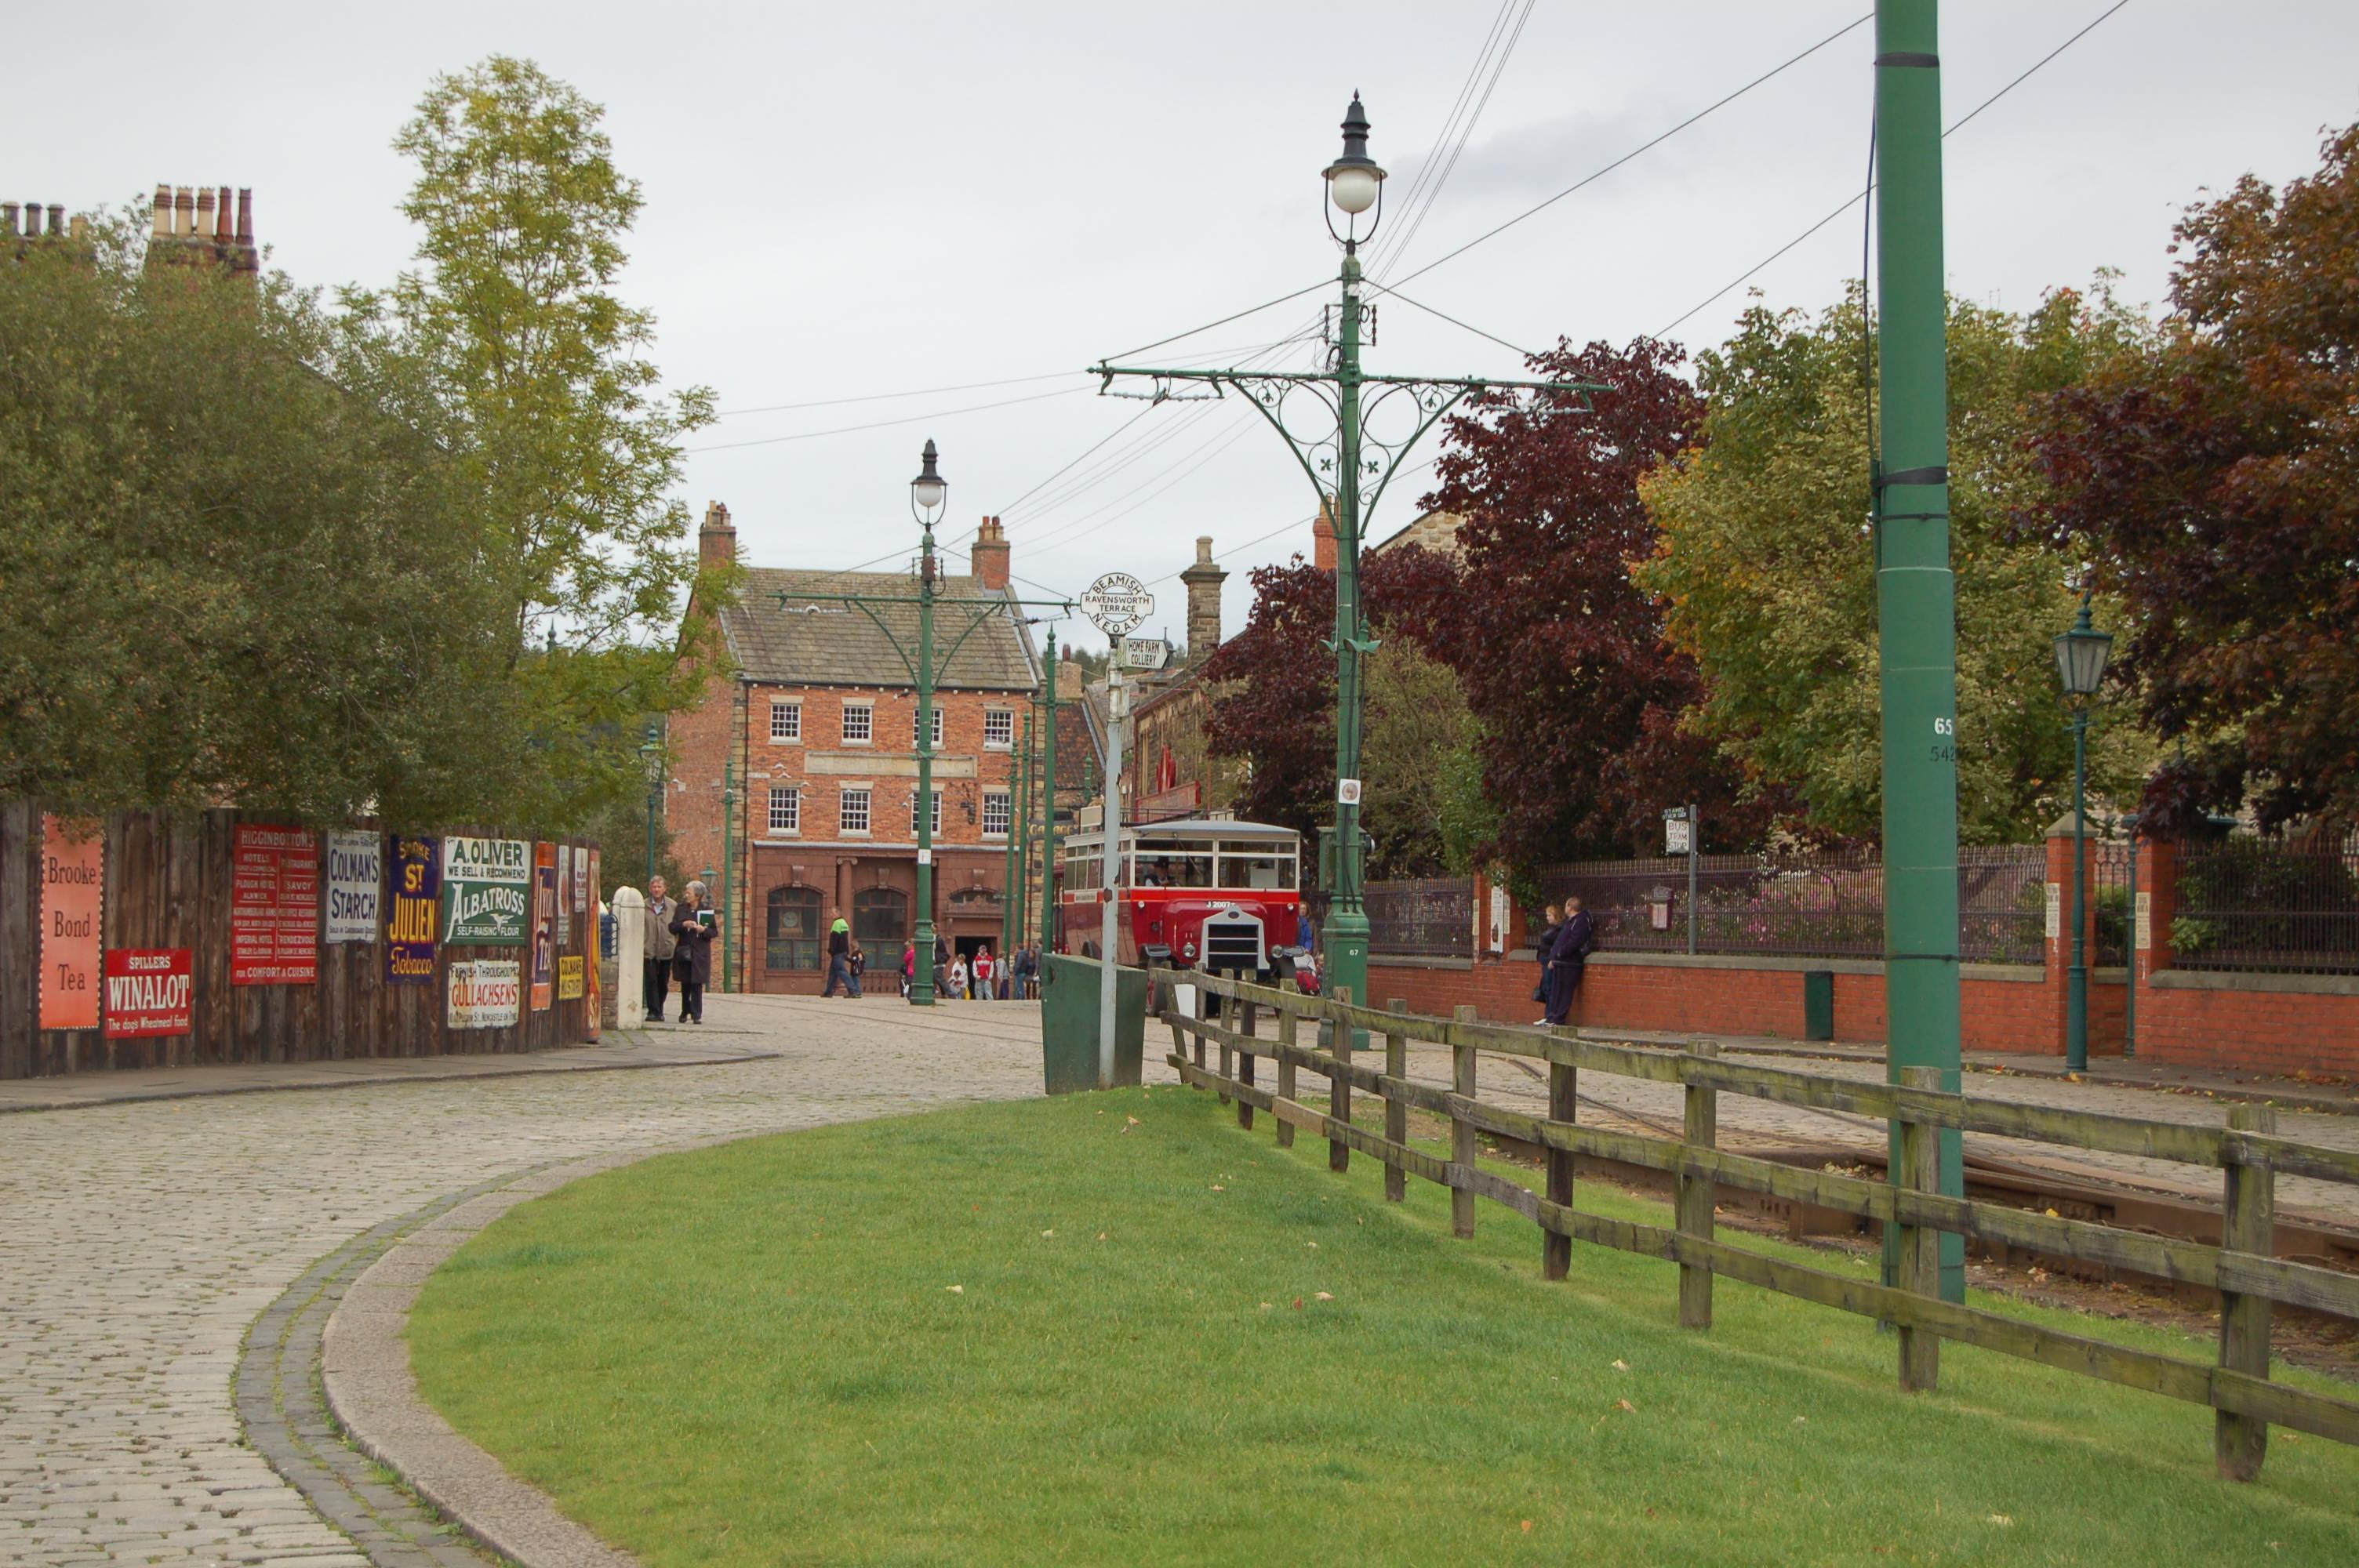 File:Town railway, Beamish Museum, 11 September 2011 (7